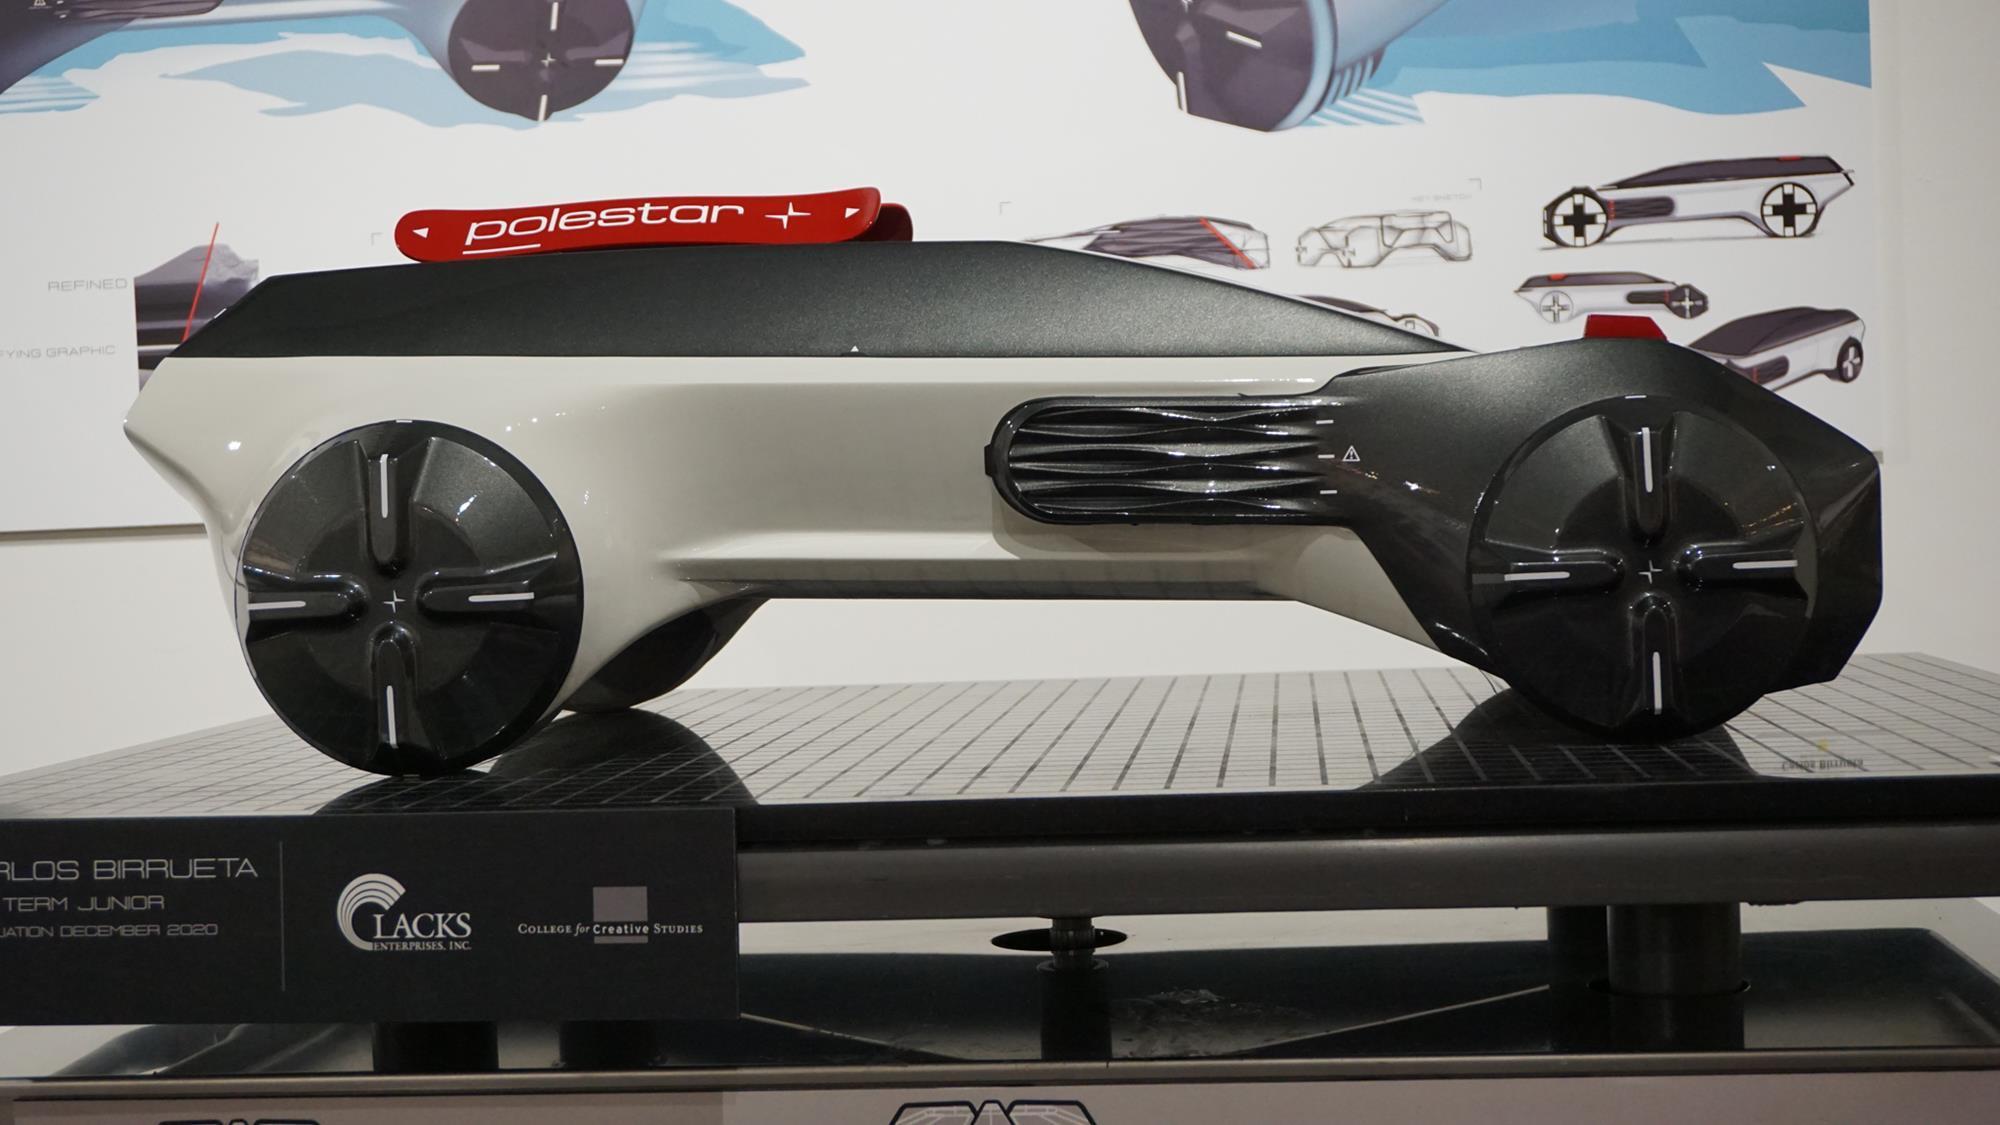 Ccs 2020 Transportation Design Winter Exhibition Article Car Design News